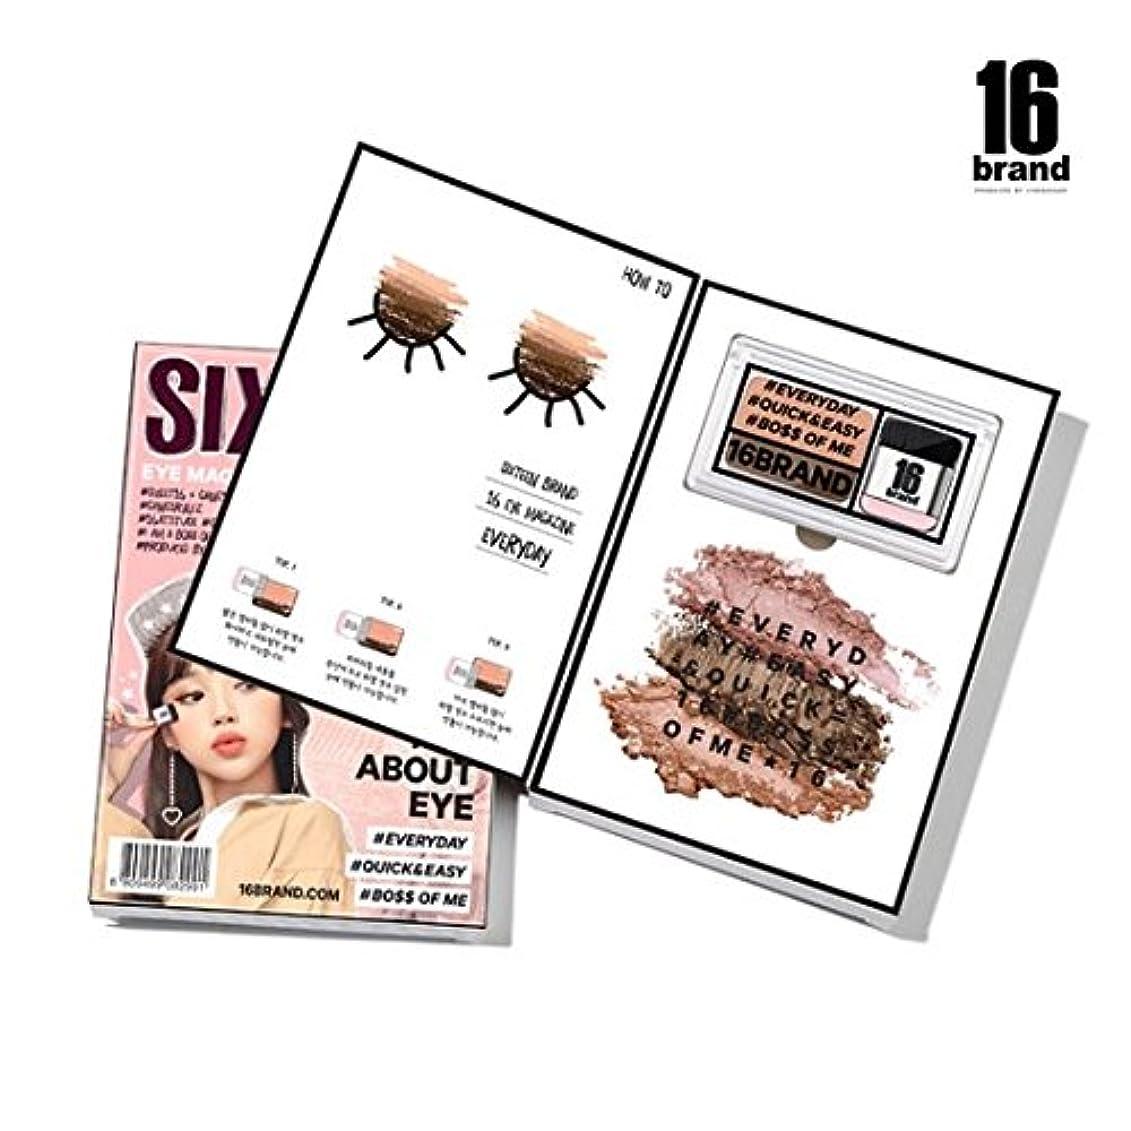 16brand Sixteen Eye Magazine Everyday 2g/16ブランド シックスティーン アイ マガジン エブリデイ 2g [並行輸入品]